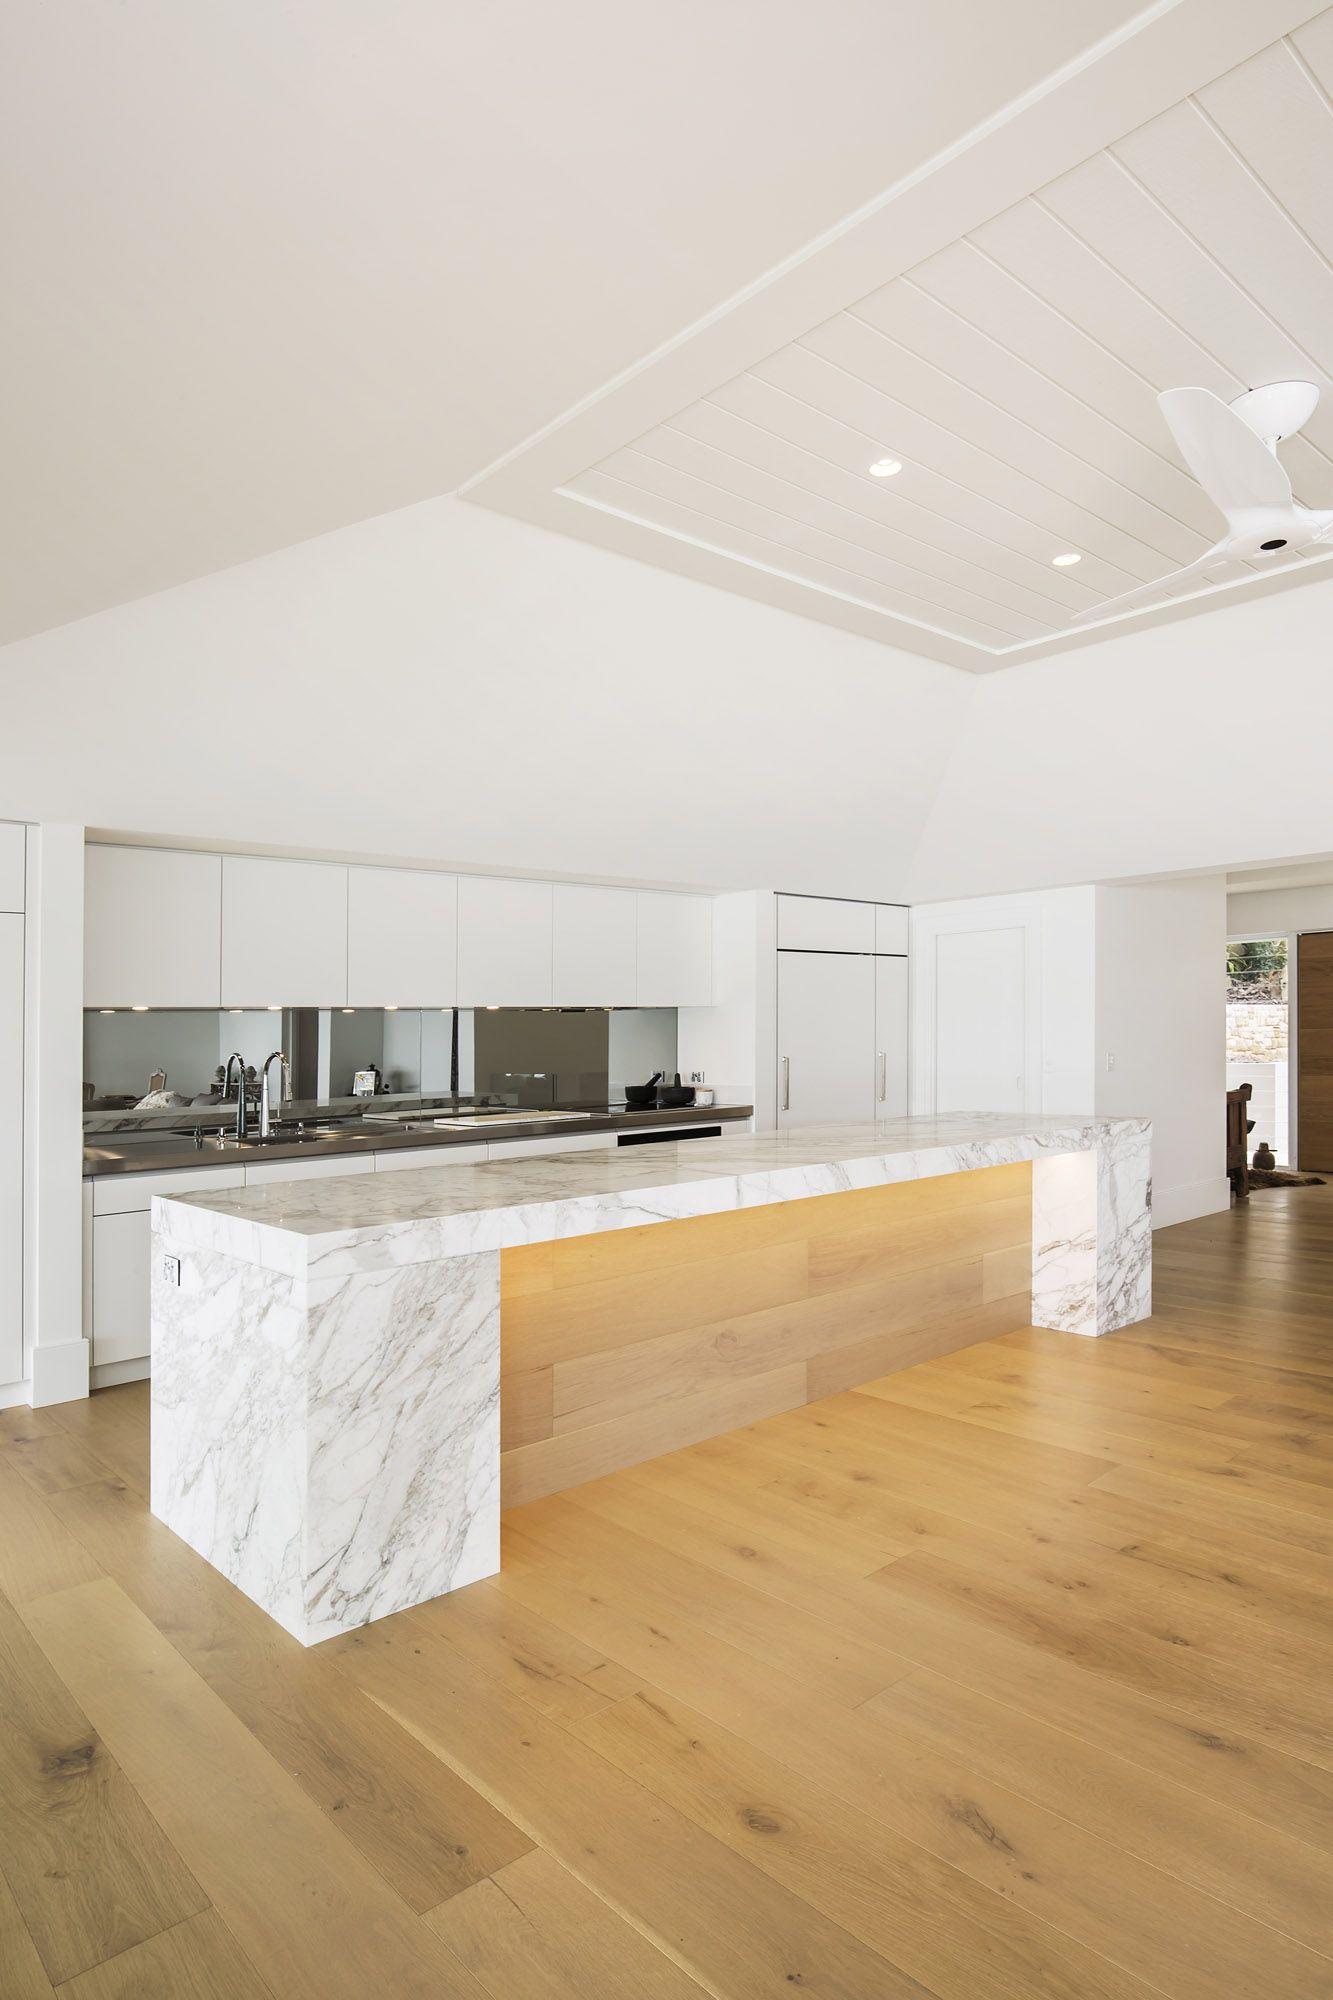 Stupendous Luxury Entertainers Kitchen With Striking Calacatta Marble Machost Co Dining Chair Design Ideas Machostcouk